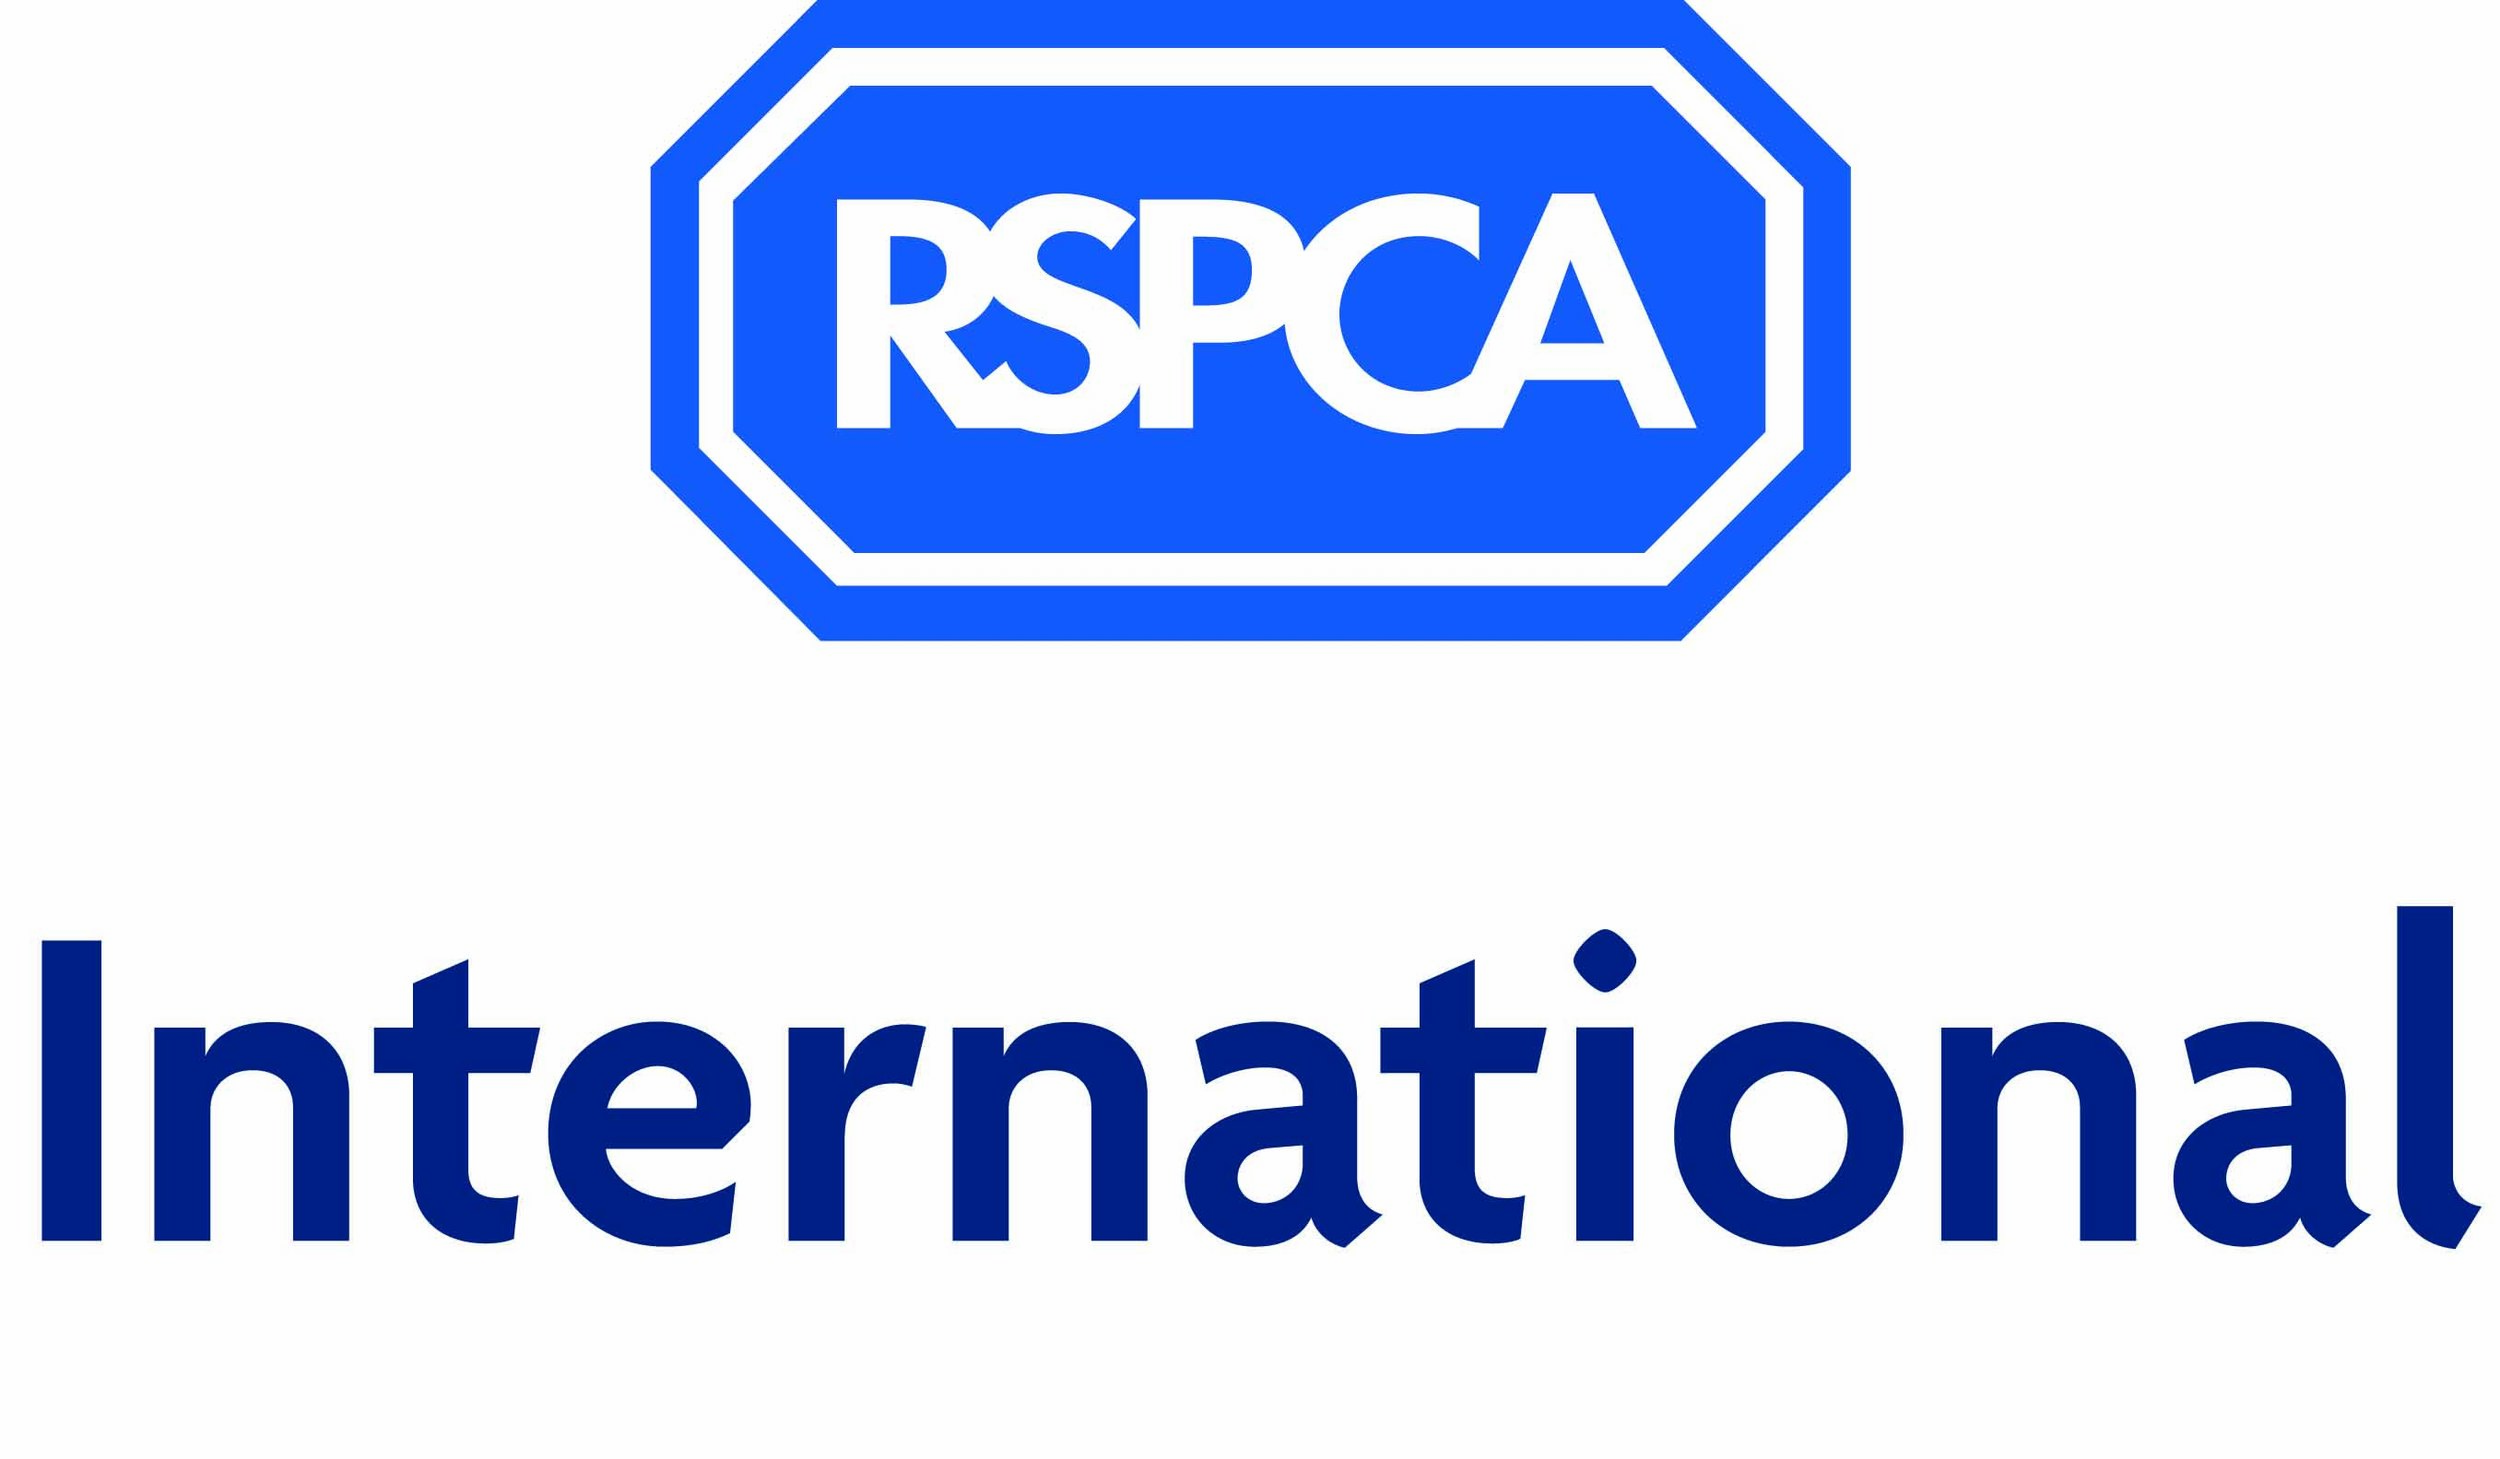 RSPCA-International-logo_Large.jpg